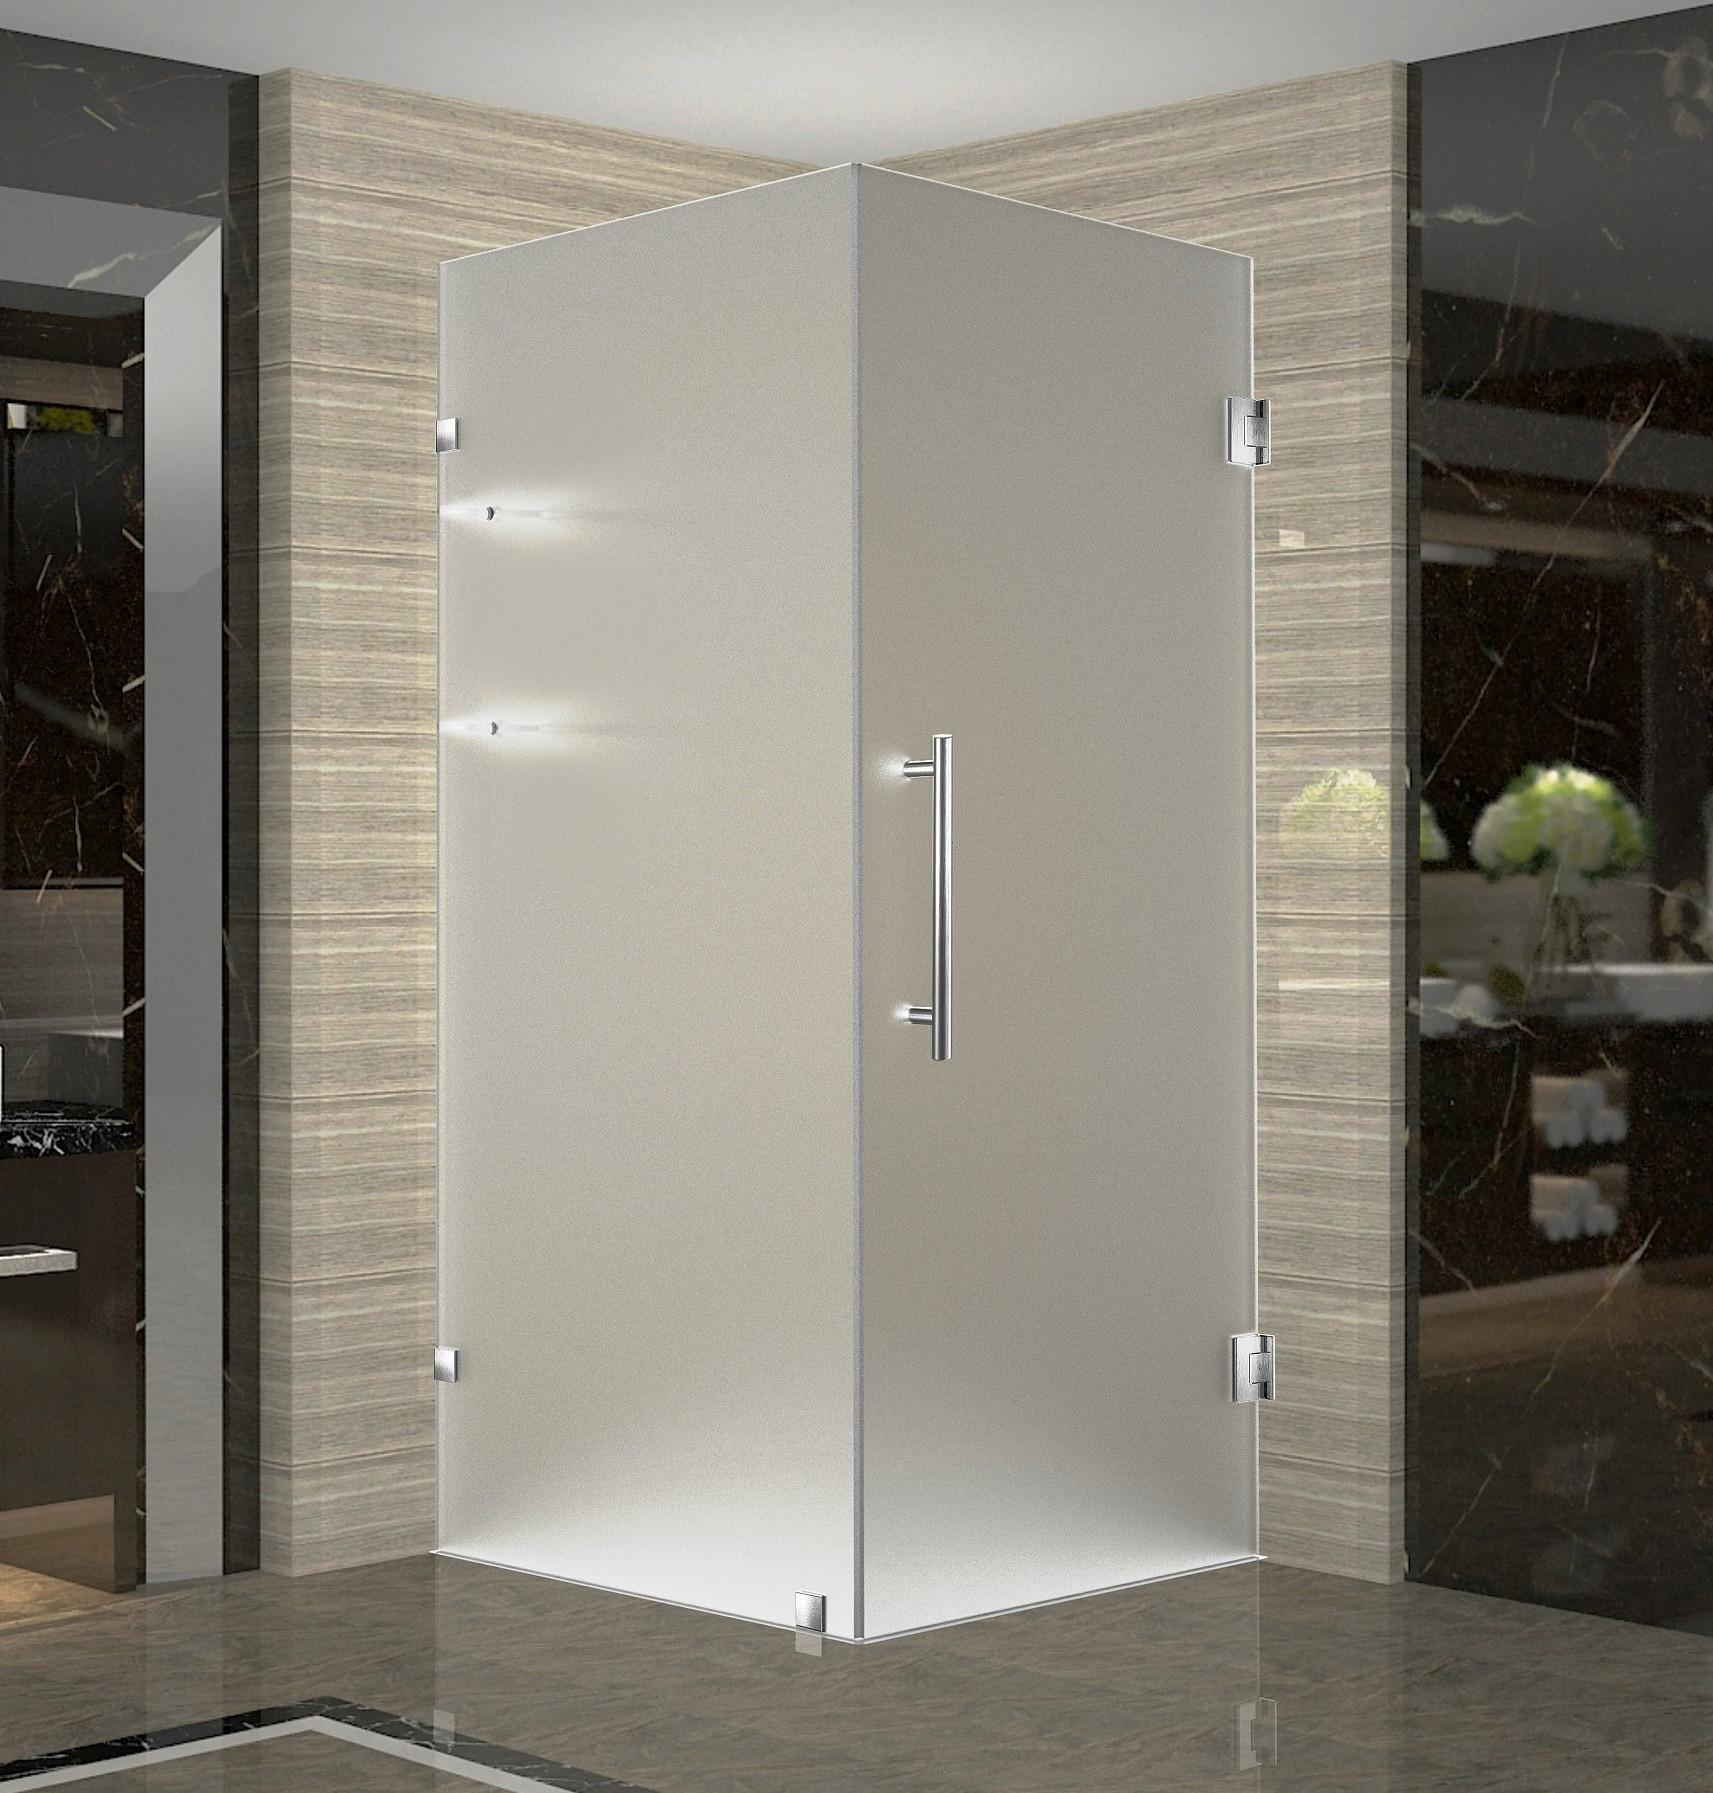 Aston SEN993F-SS-34-10 Stainless Steel Completely Frameless Square Shower Enclosure with Shelves